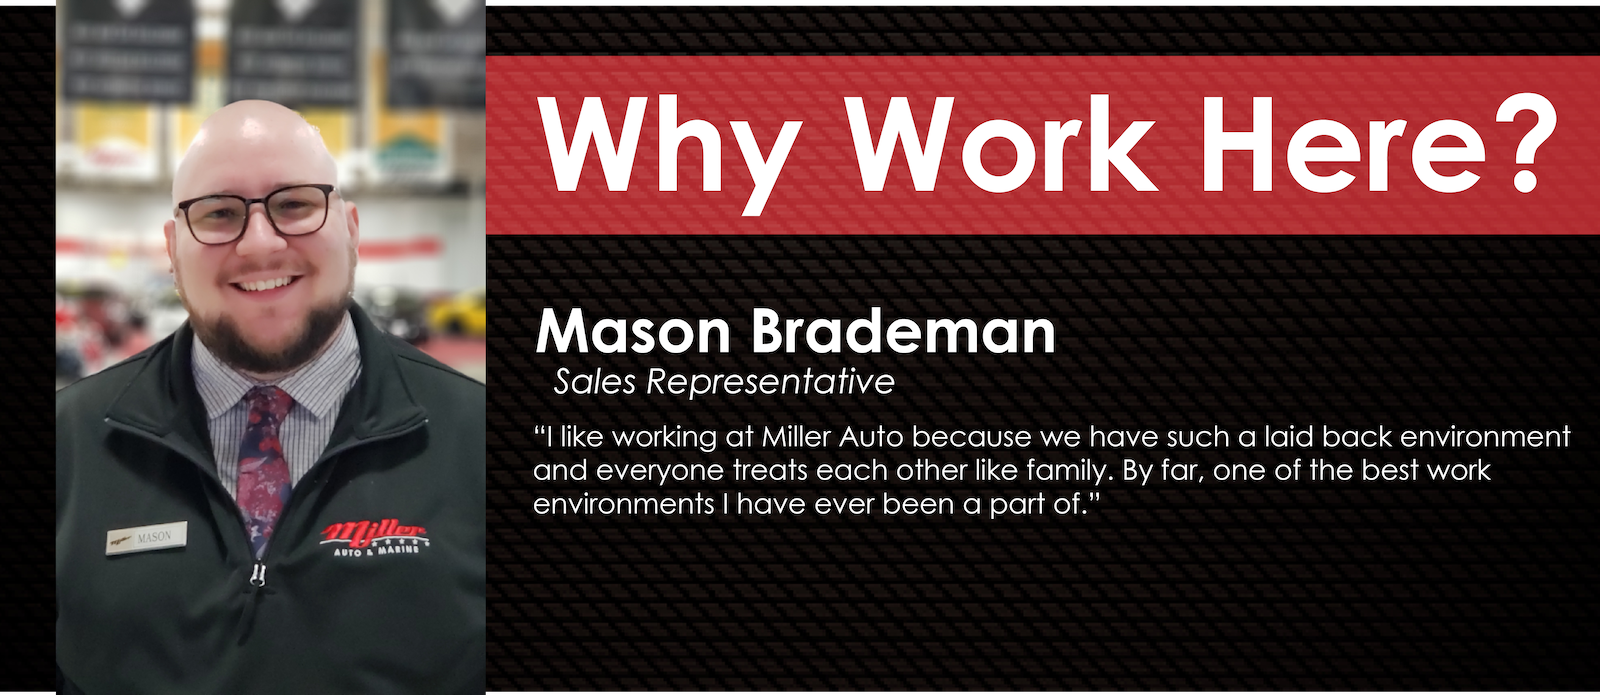 Mason Brademan